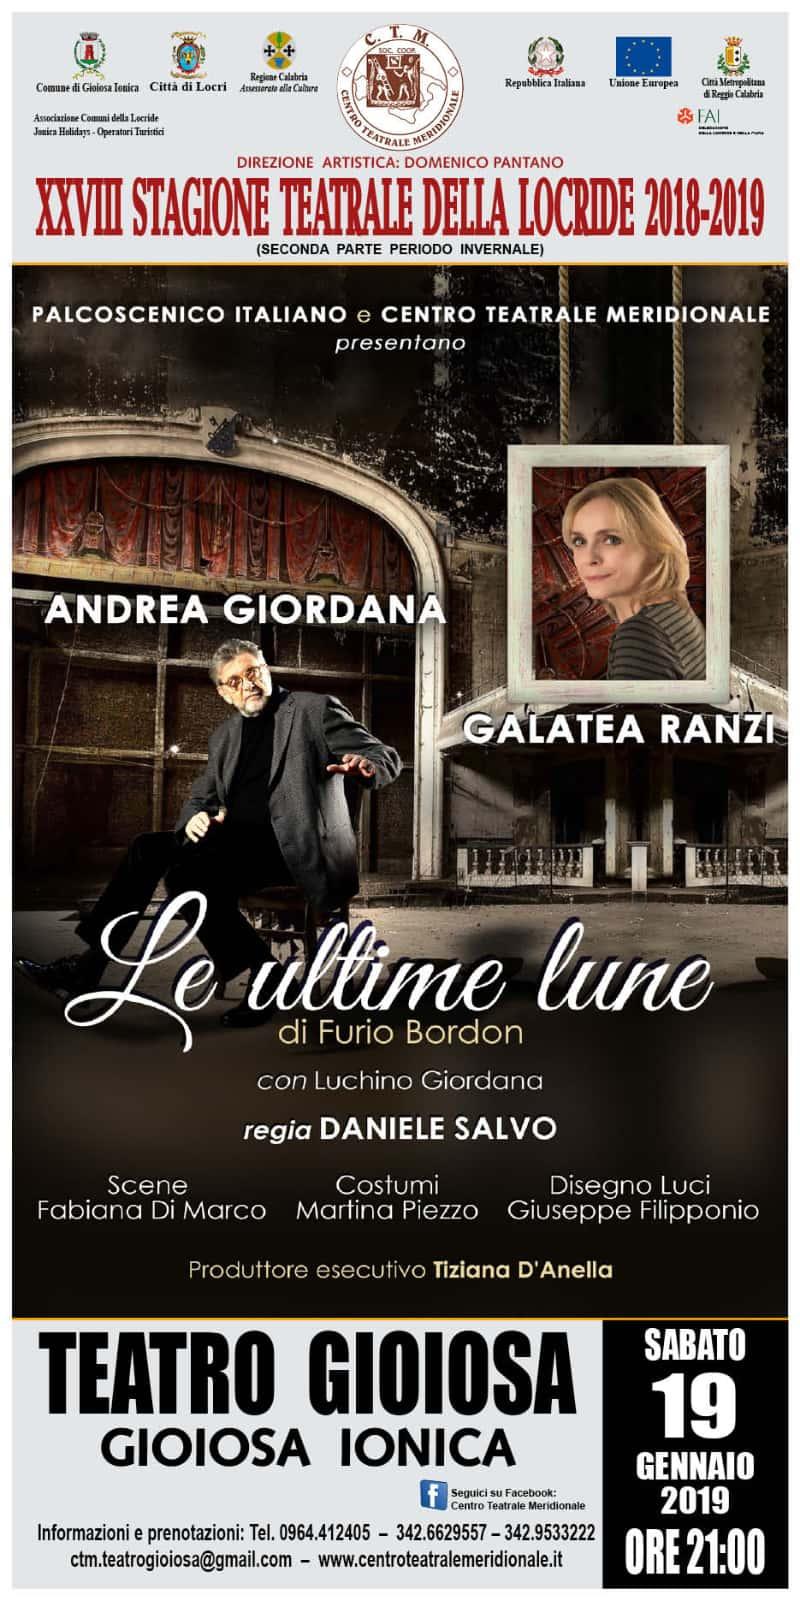 Andrea Giordana e Galatea Renzi 19 gennaio 2019 Gioiosa Ionica locandina